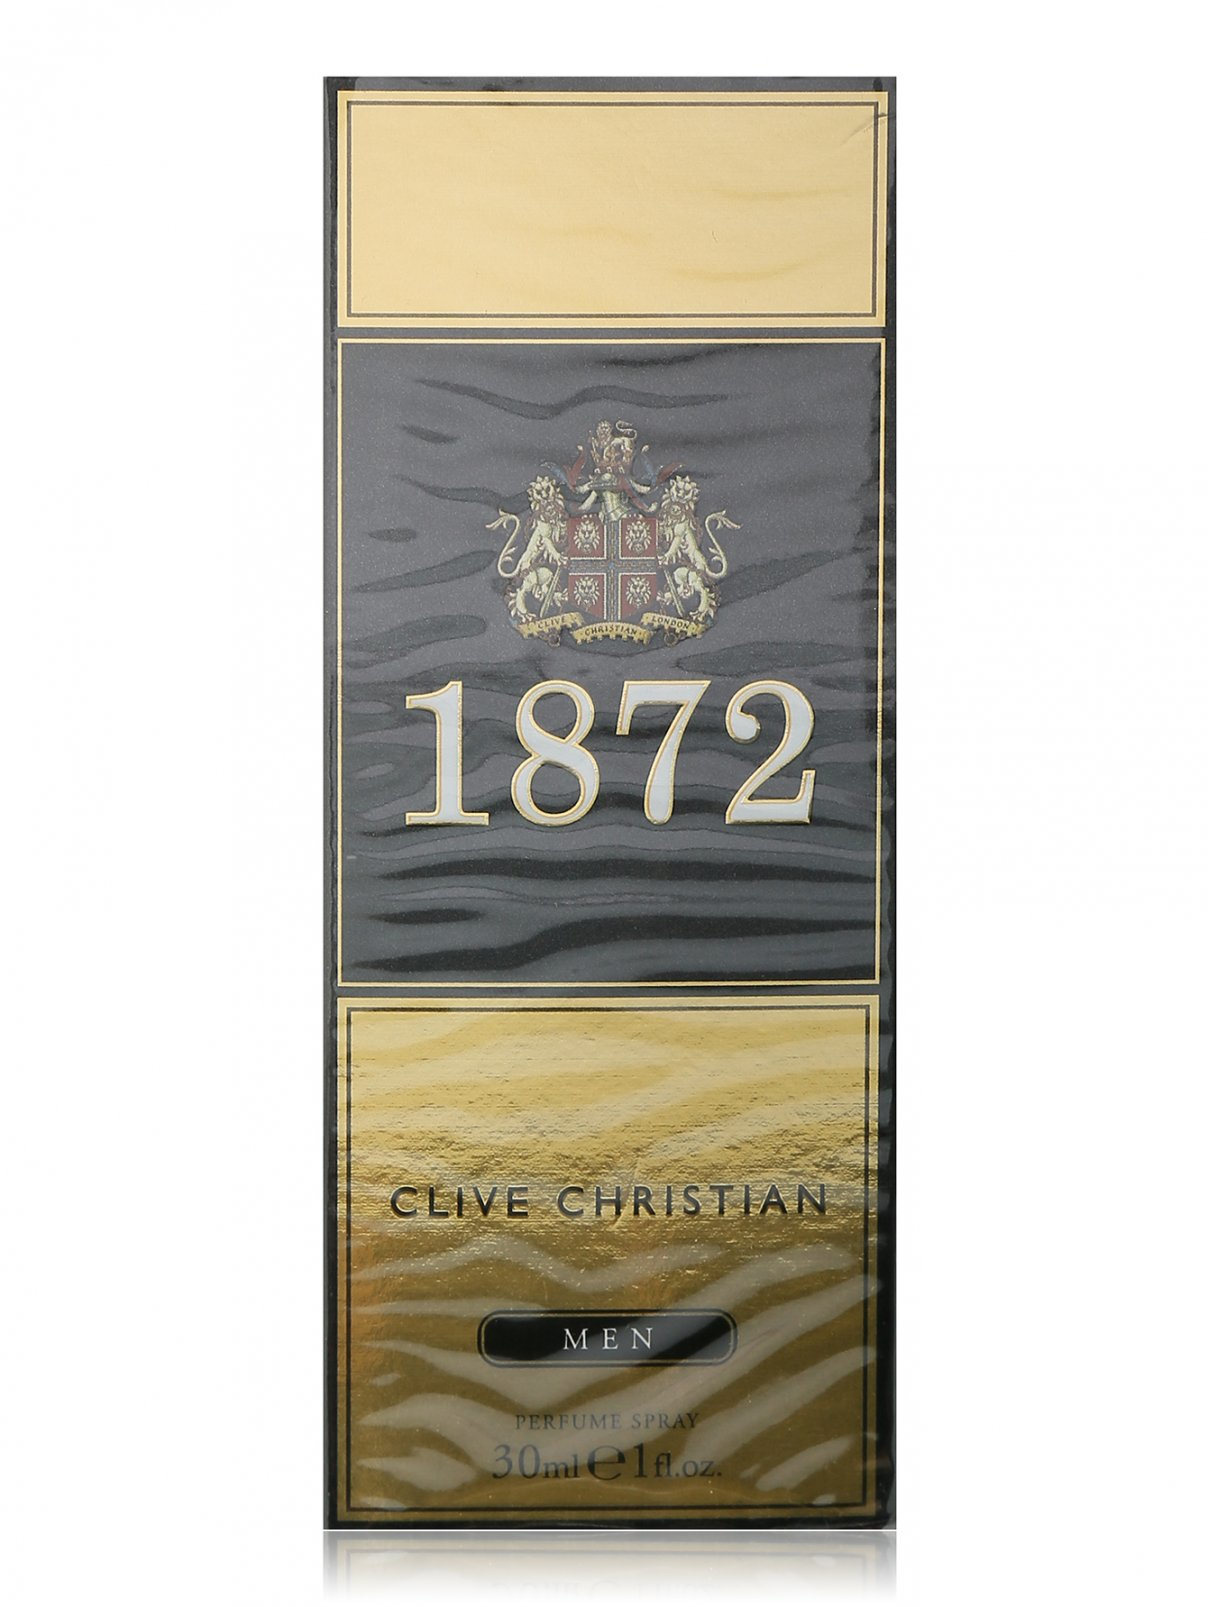 Парфюмерная вода 30 мл 1872 Clive Christian  –  Общий вид